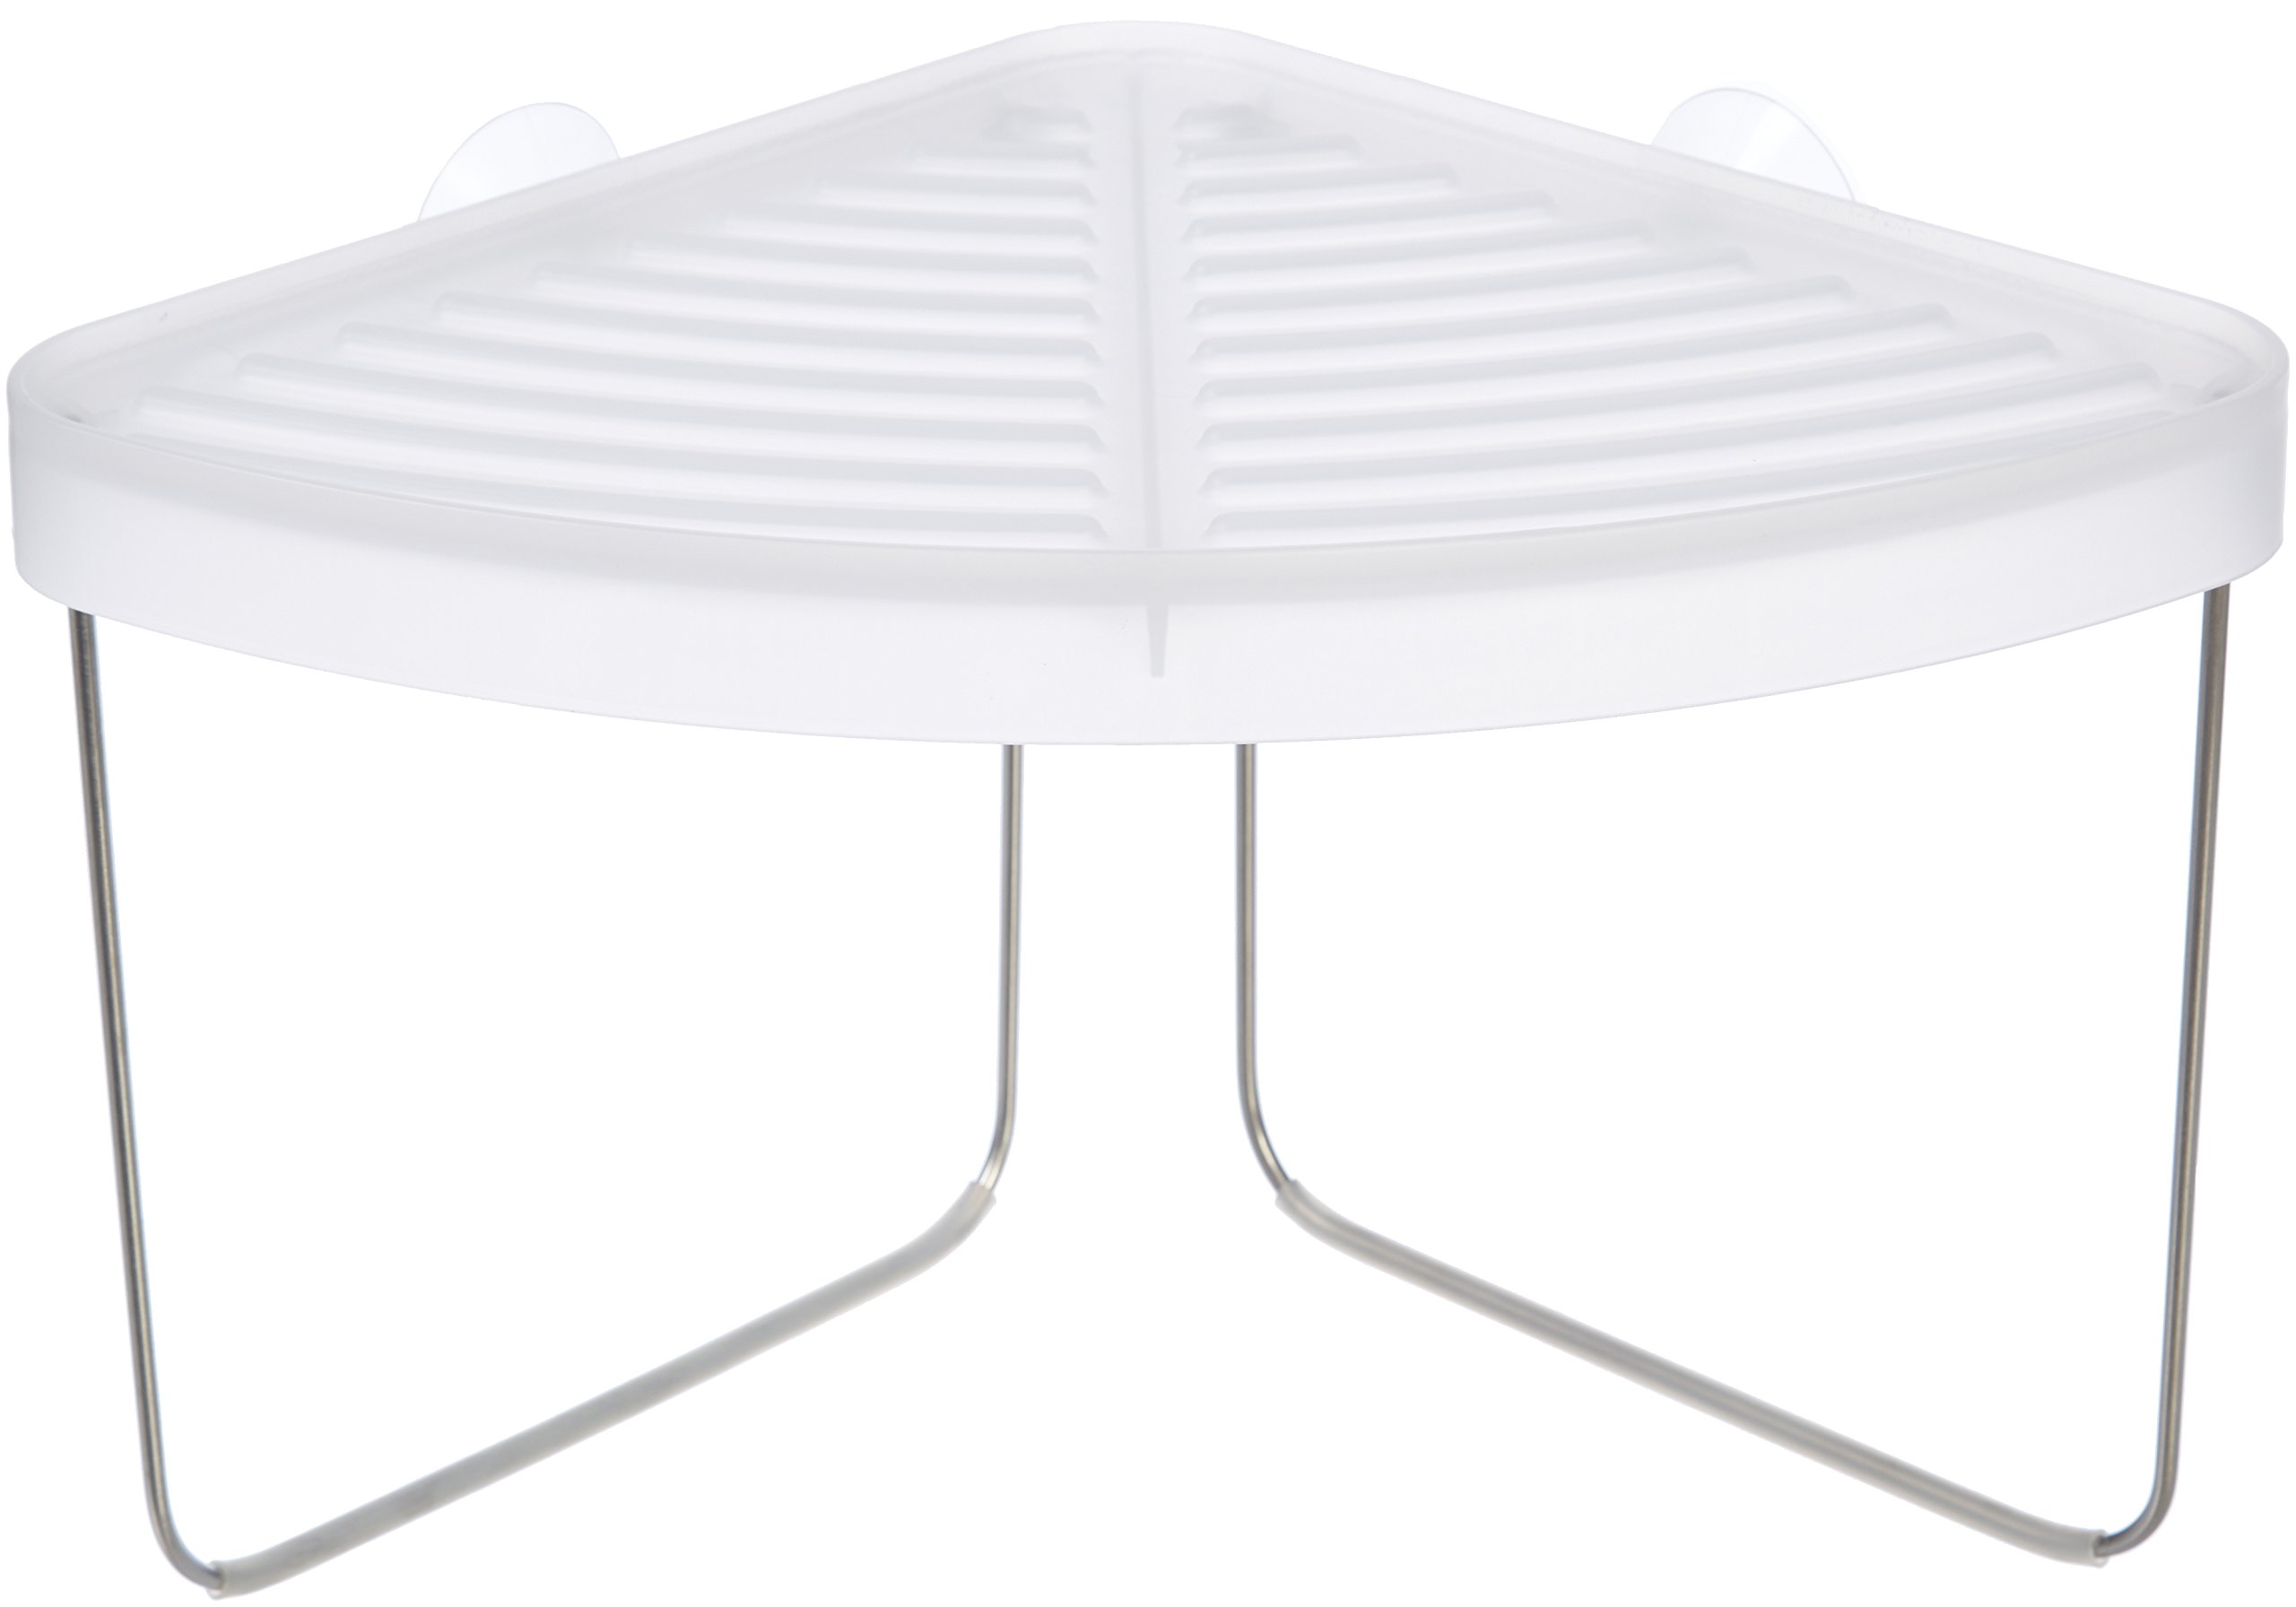 AmazonBasics Shower Baskets